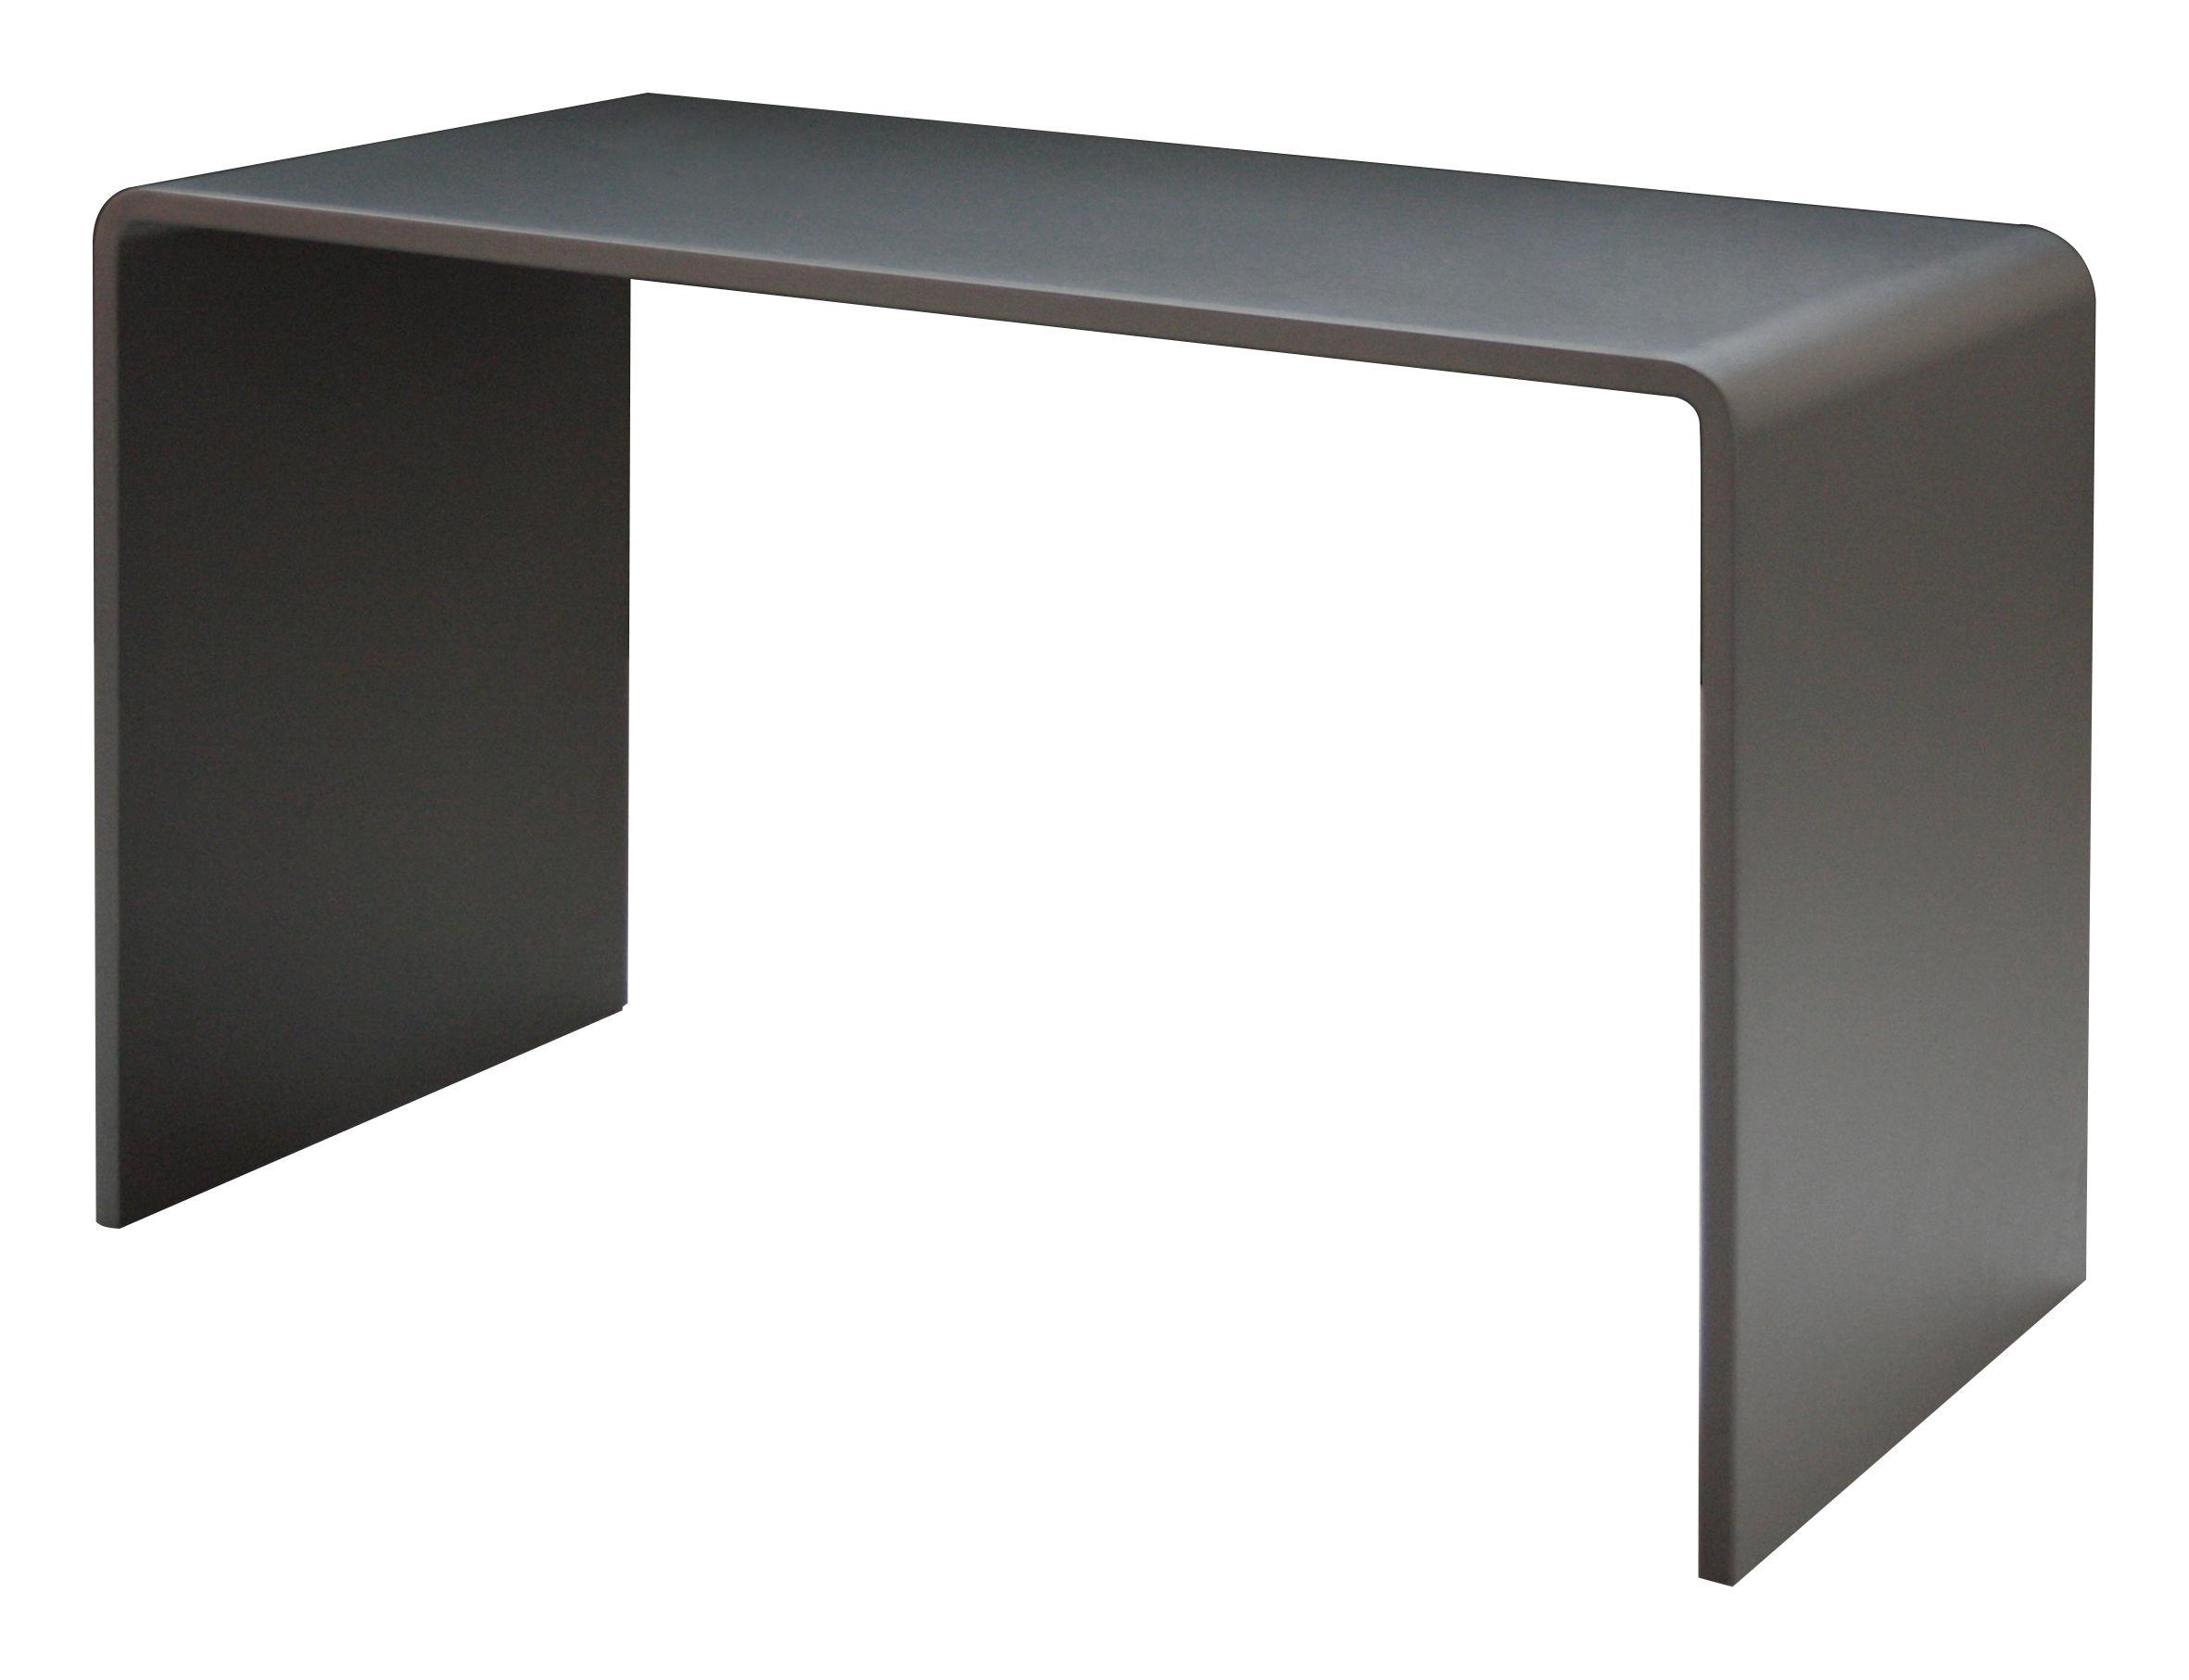 Solitaire desk l 120 cm dark grey by zeus